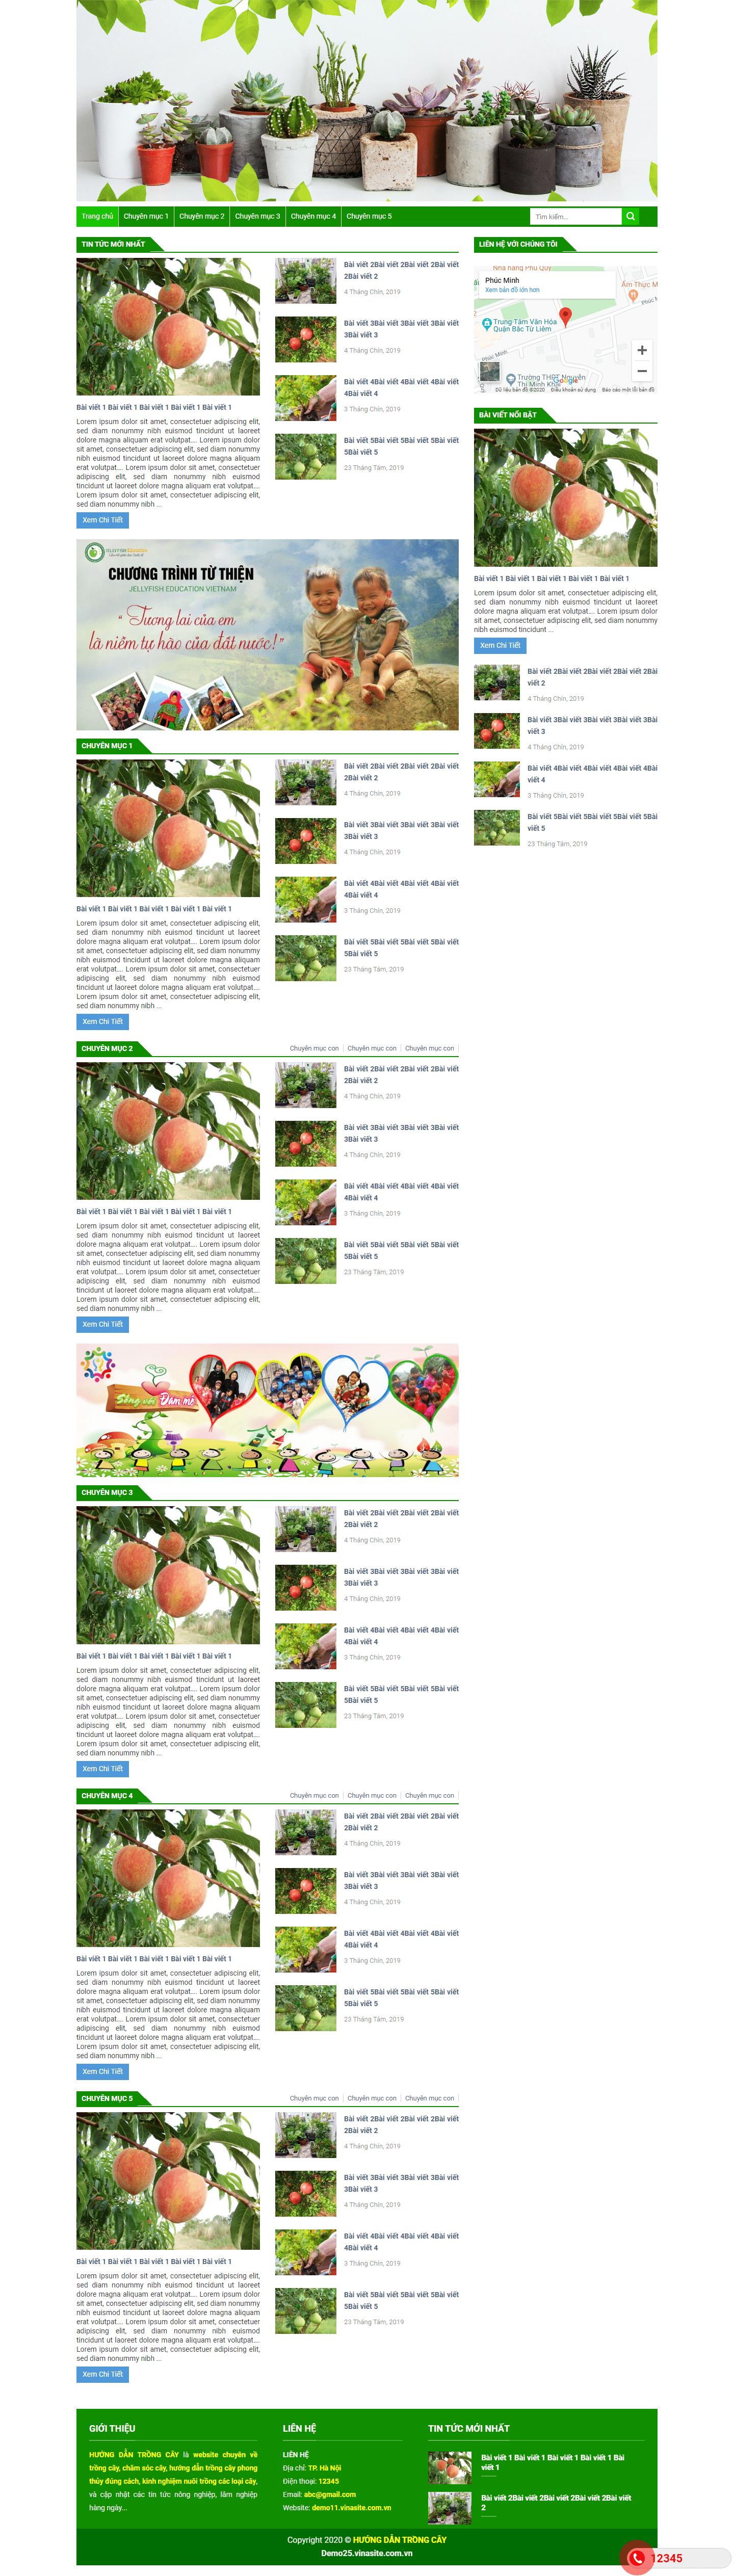 huongdantrongcay.com